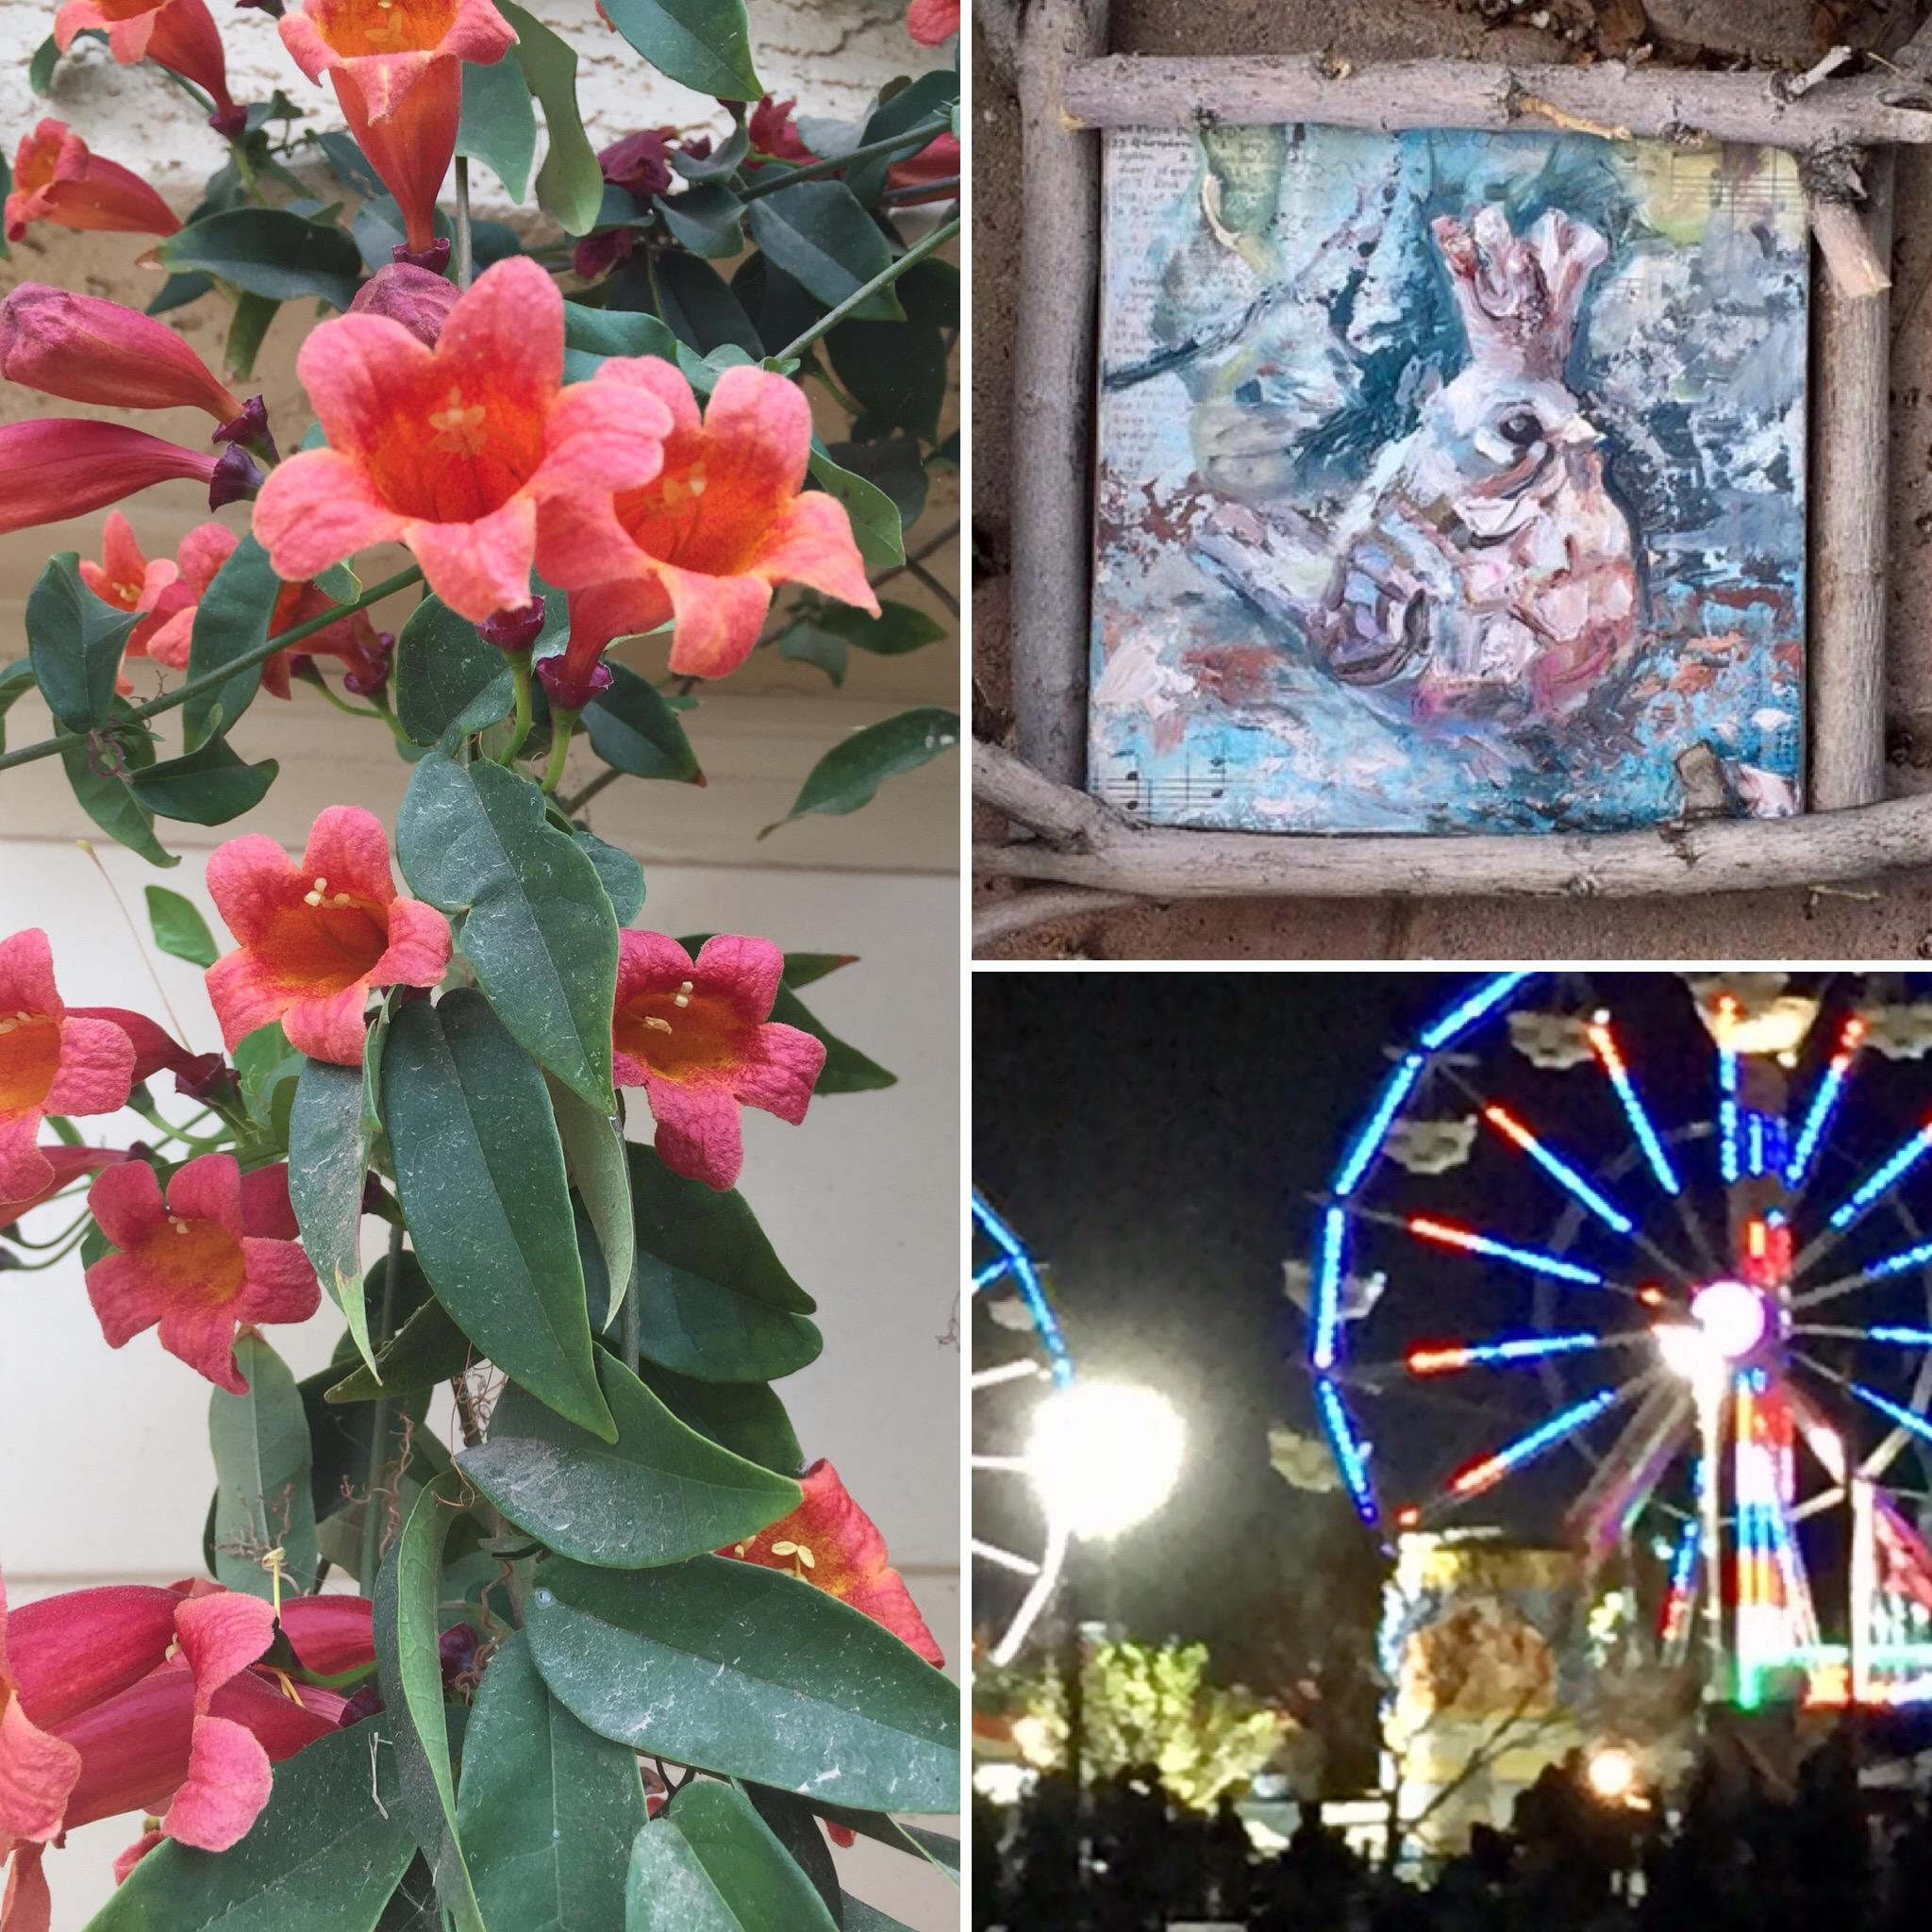 gardenart collage.JPG